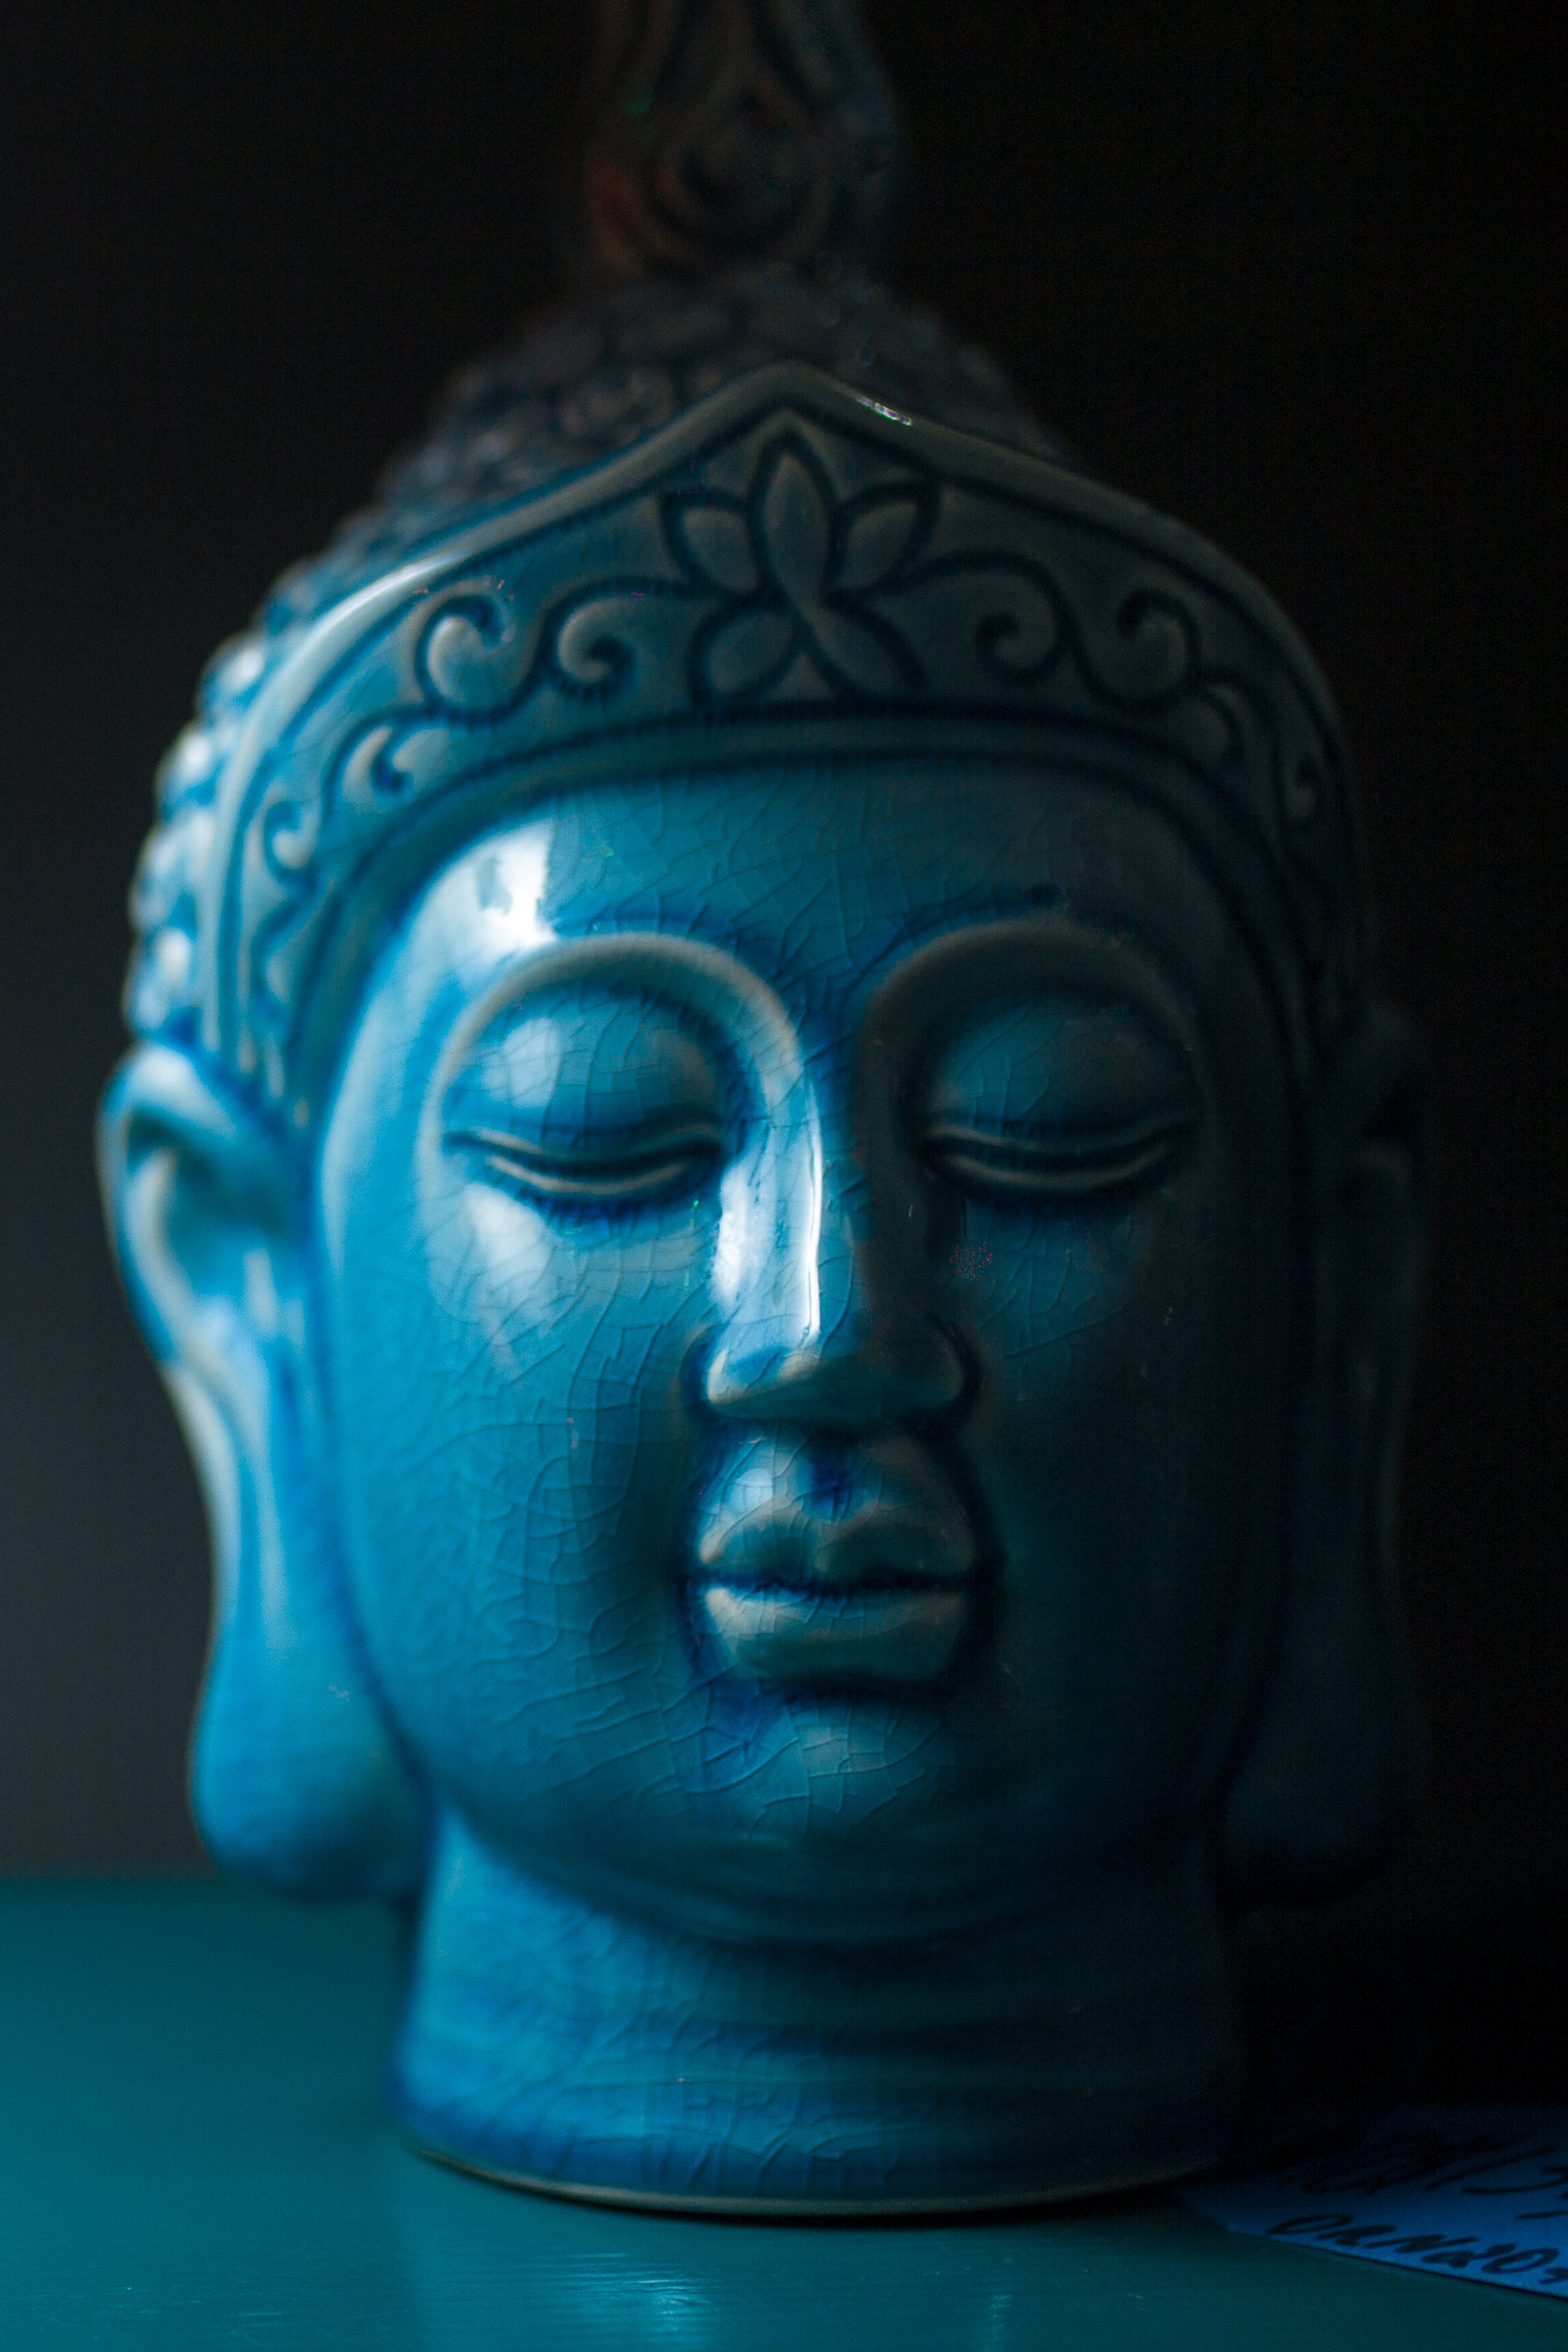 Kostenloses Stock Foto zu mann, kunst, blau, kopf